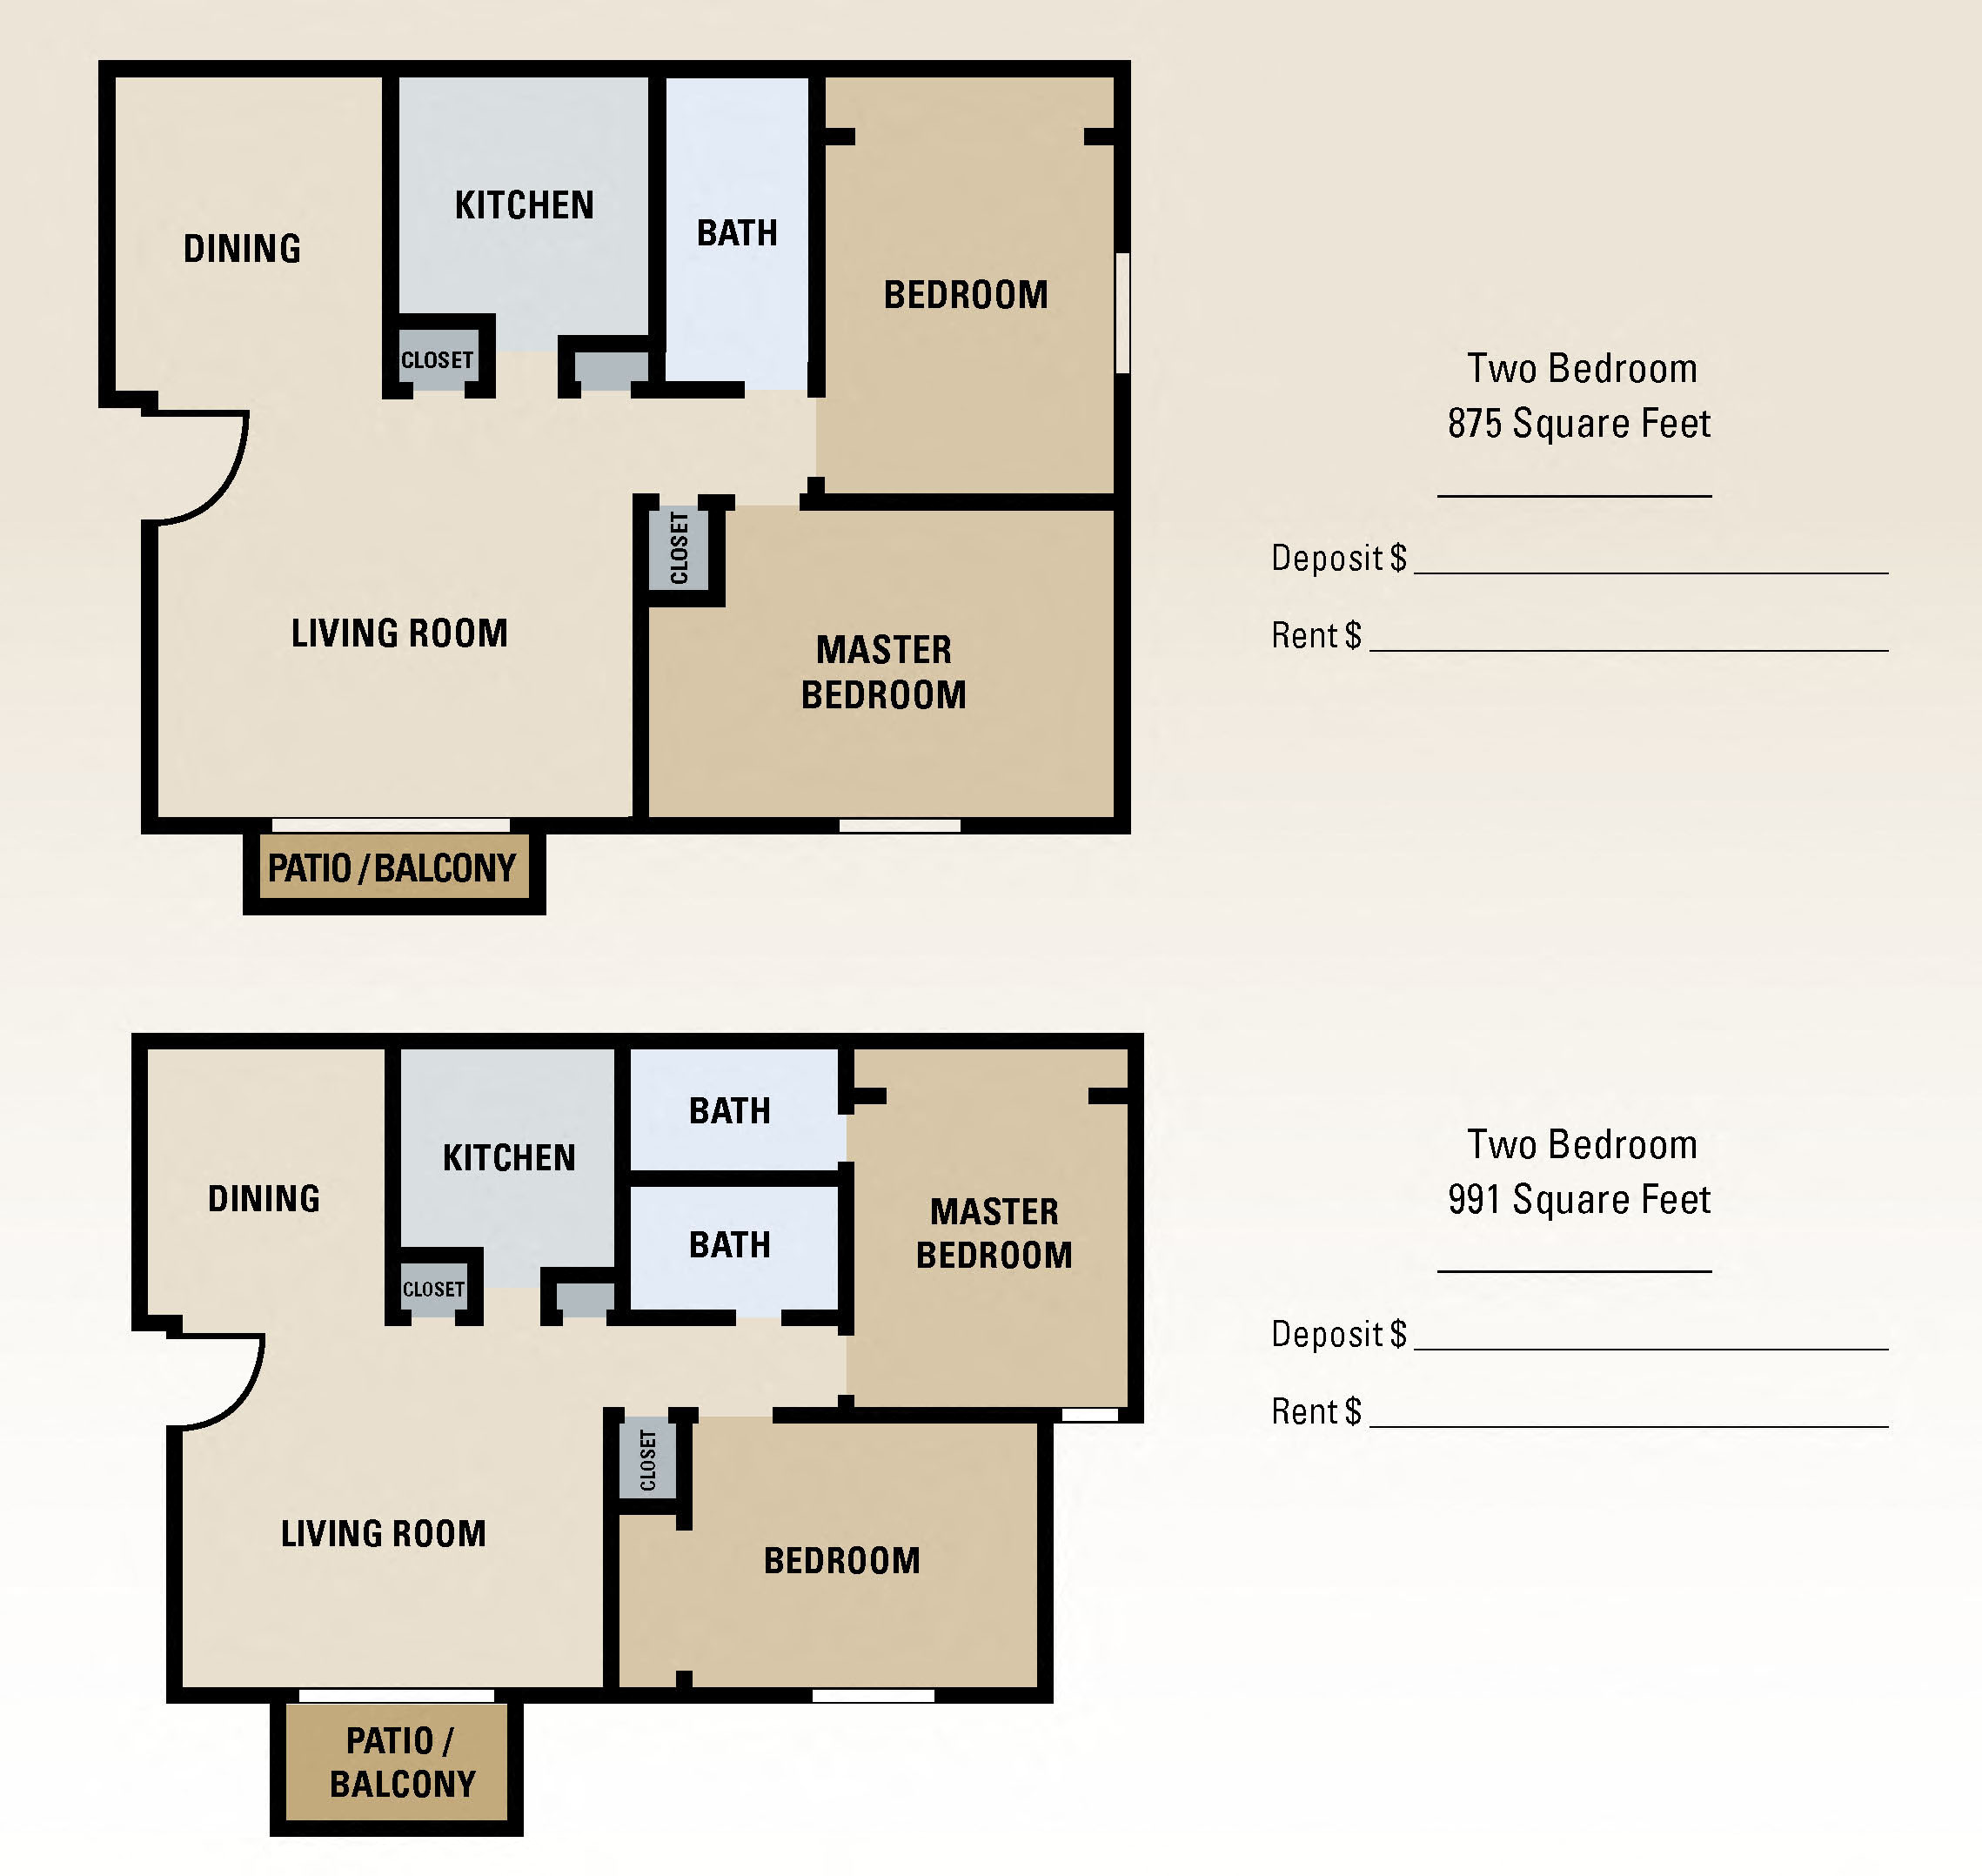 eastgate apartments, 632 s eastern, wichita, ks - rentcafé